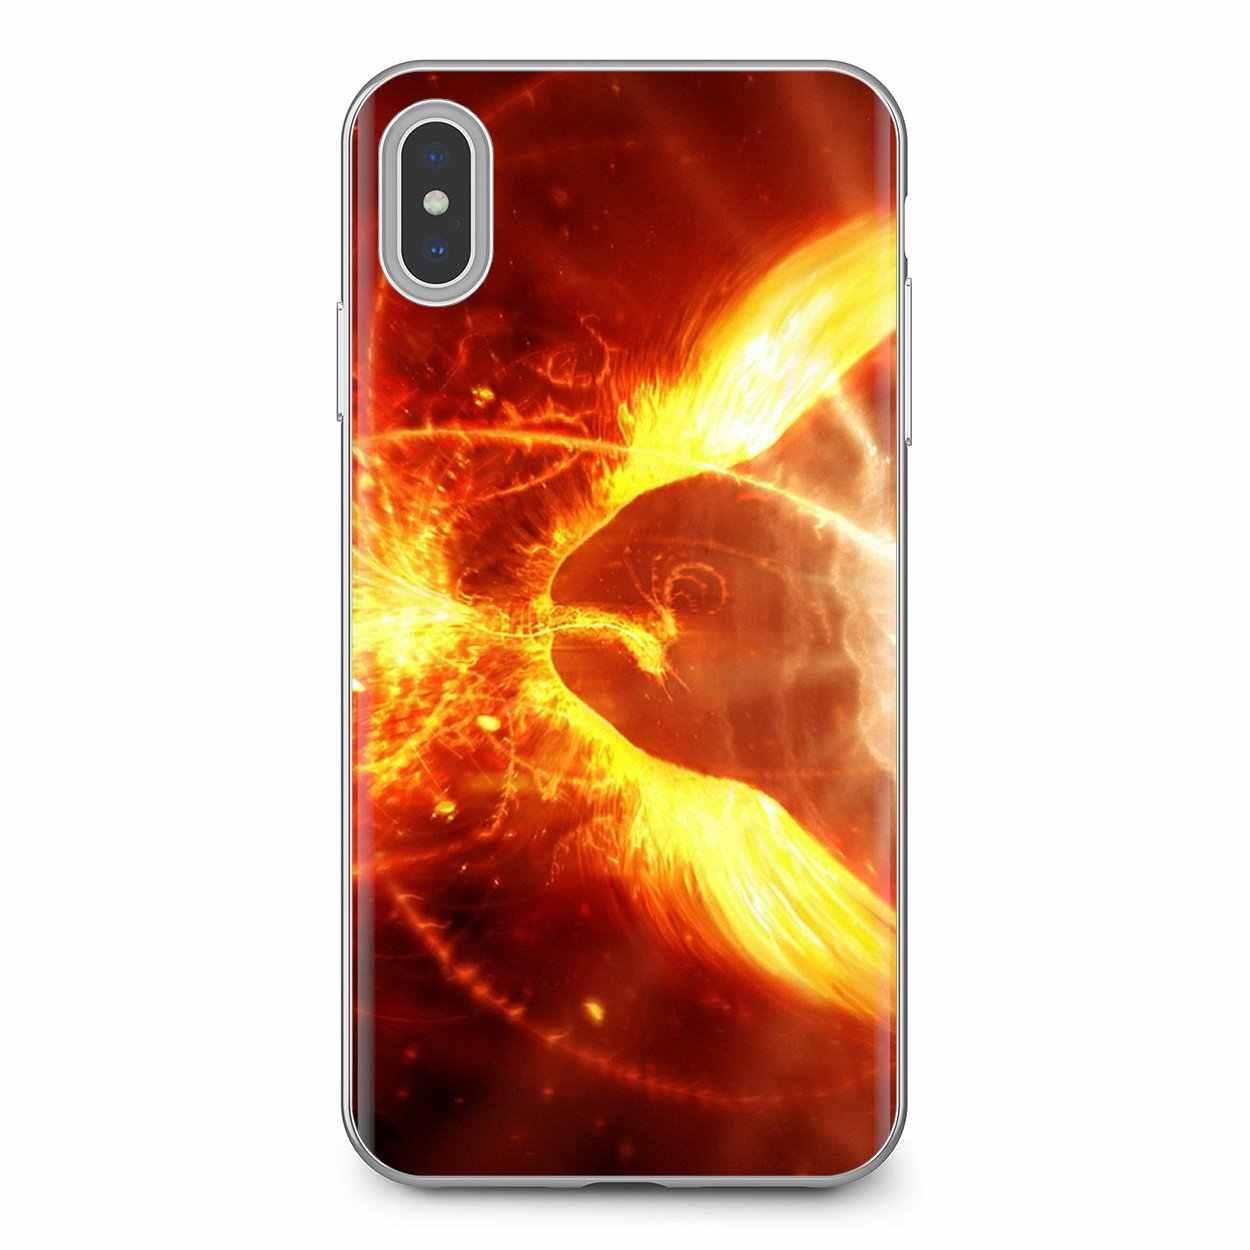 جراب هاتف سيليكون رائع فينيكس ايكاروس دوتا 2 ألعاب فنية لموتورولا موتو G G2 G3 X4 E4 E5 G5 G5S G6 Z Z2 Z3 C Play Plus